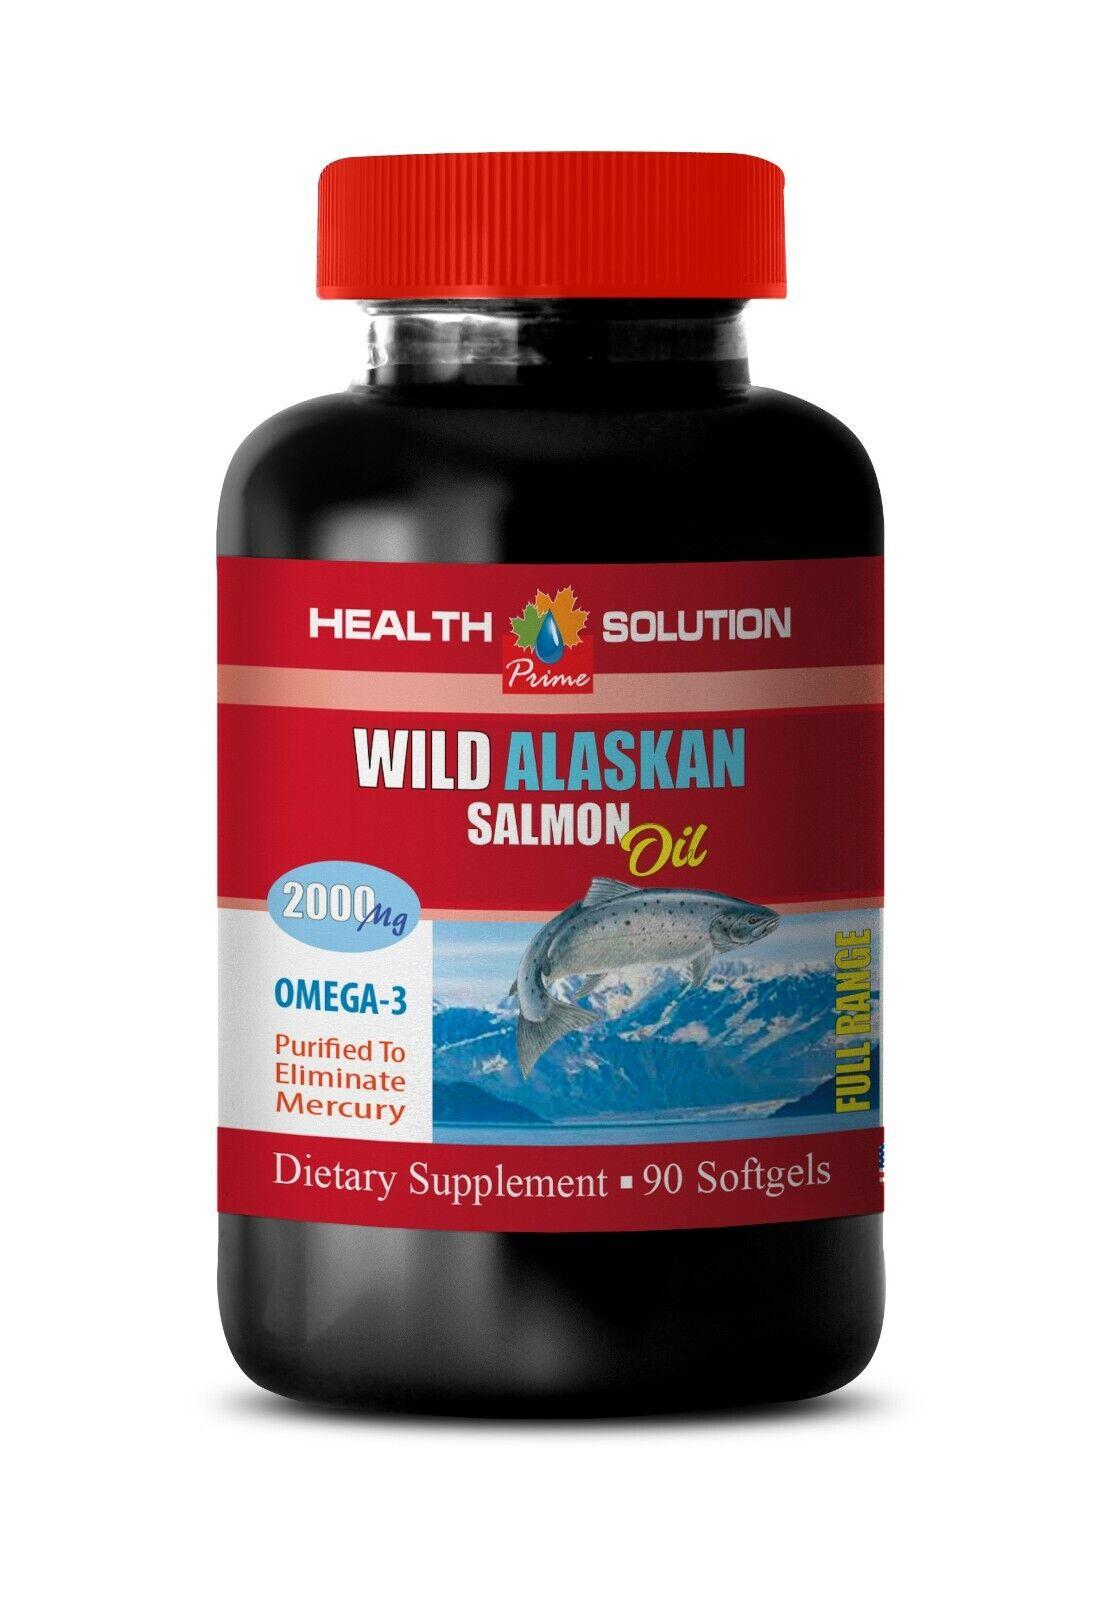 fish oil pills - ALASKAN SALMON OIL 2000MG - lower cholester